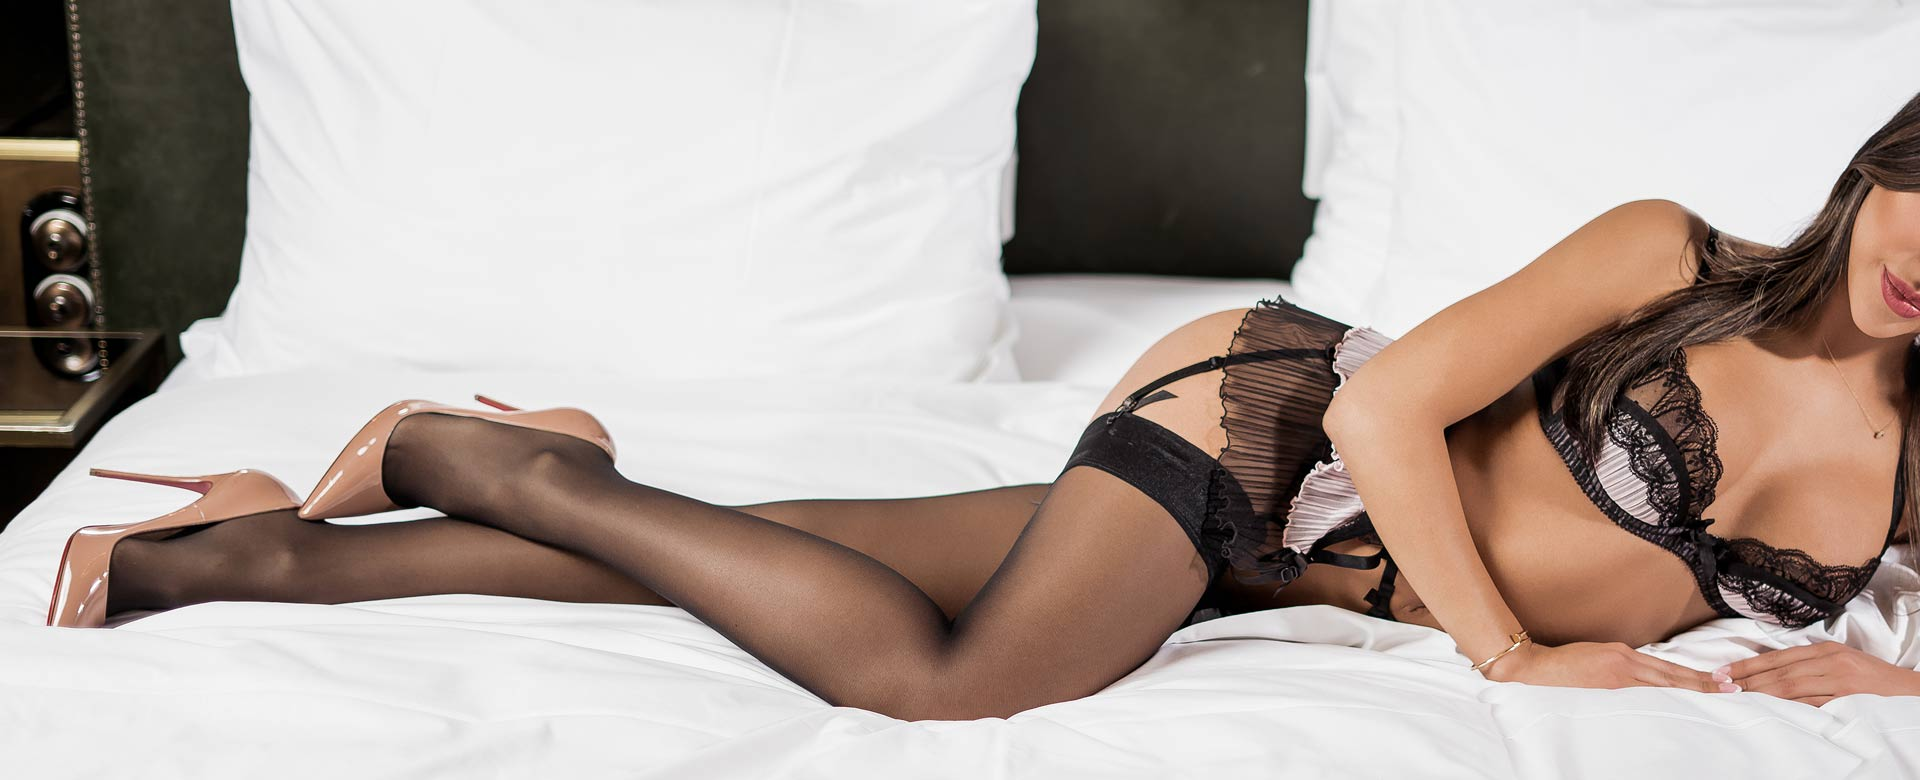 Modella escort bisessuale Saphira